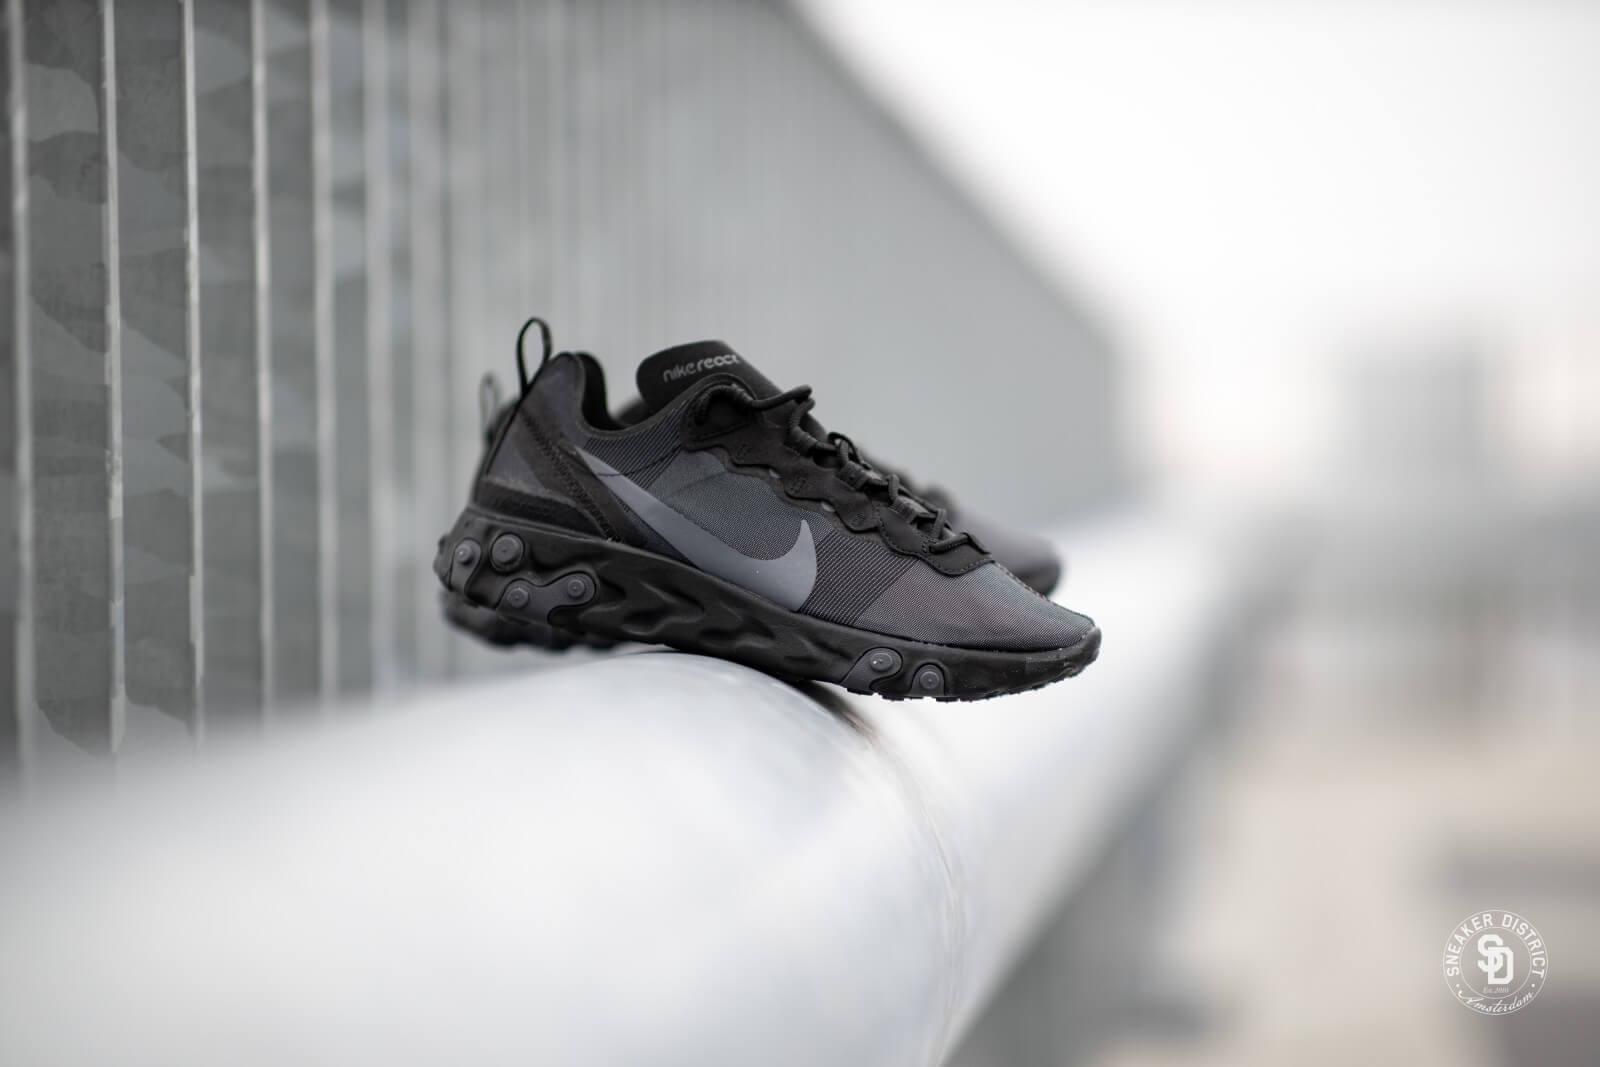 ligeramente dispersión Insistir  Nike React Element 55 Black/Dark Grey - BQ6166-008